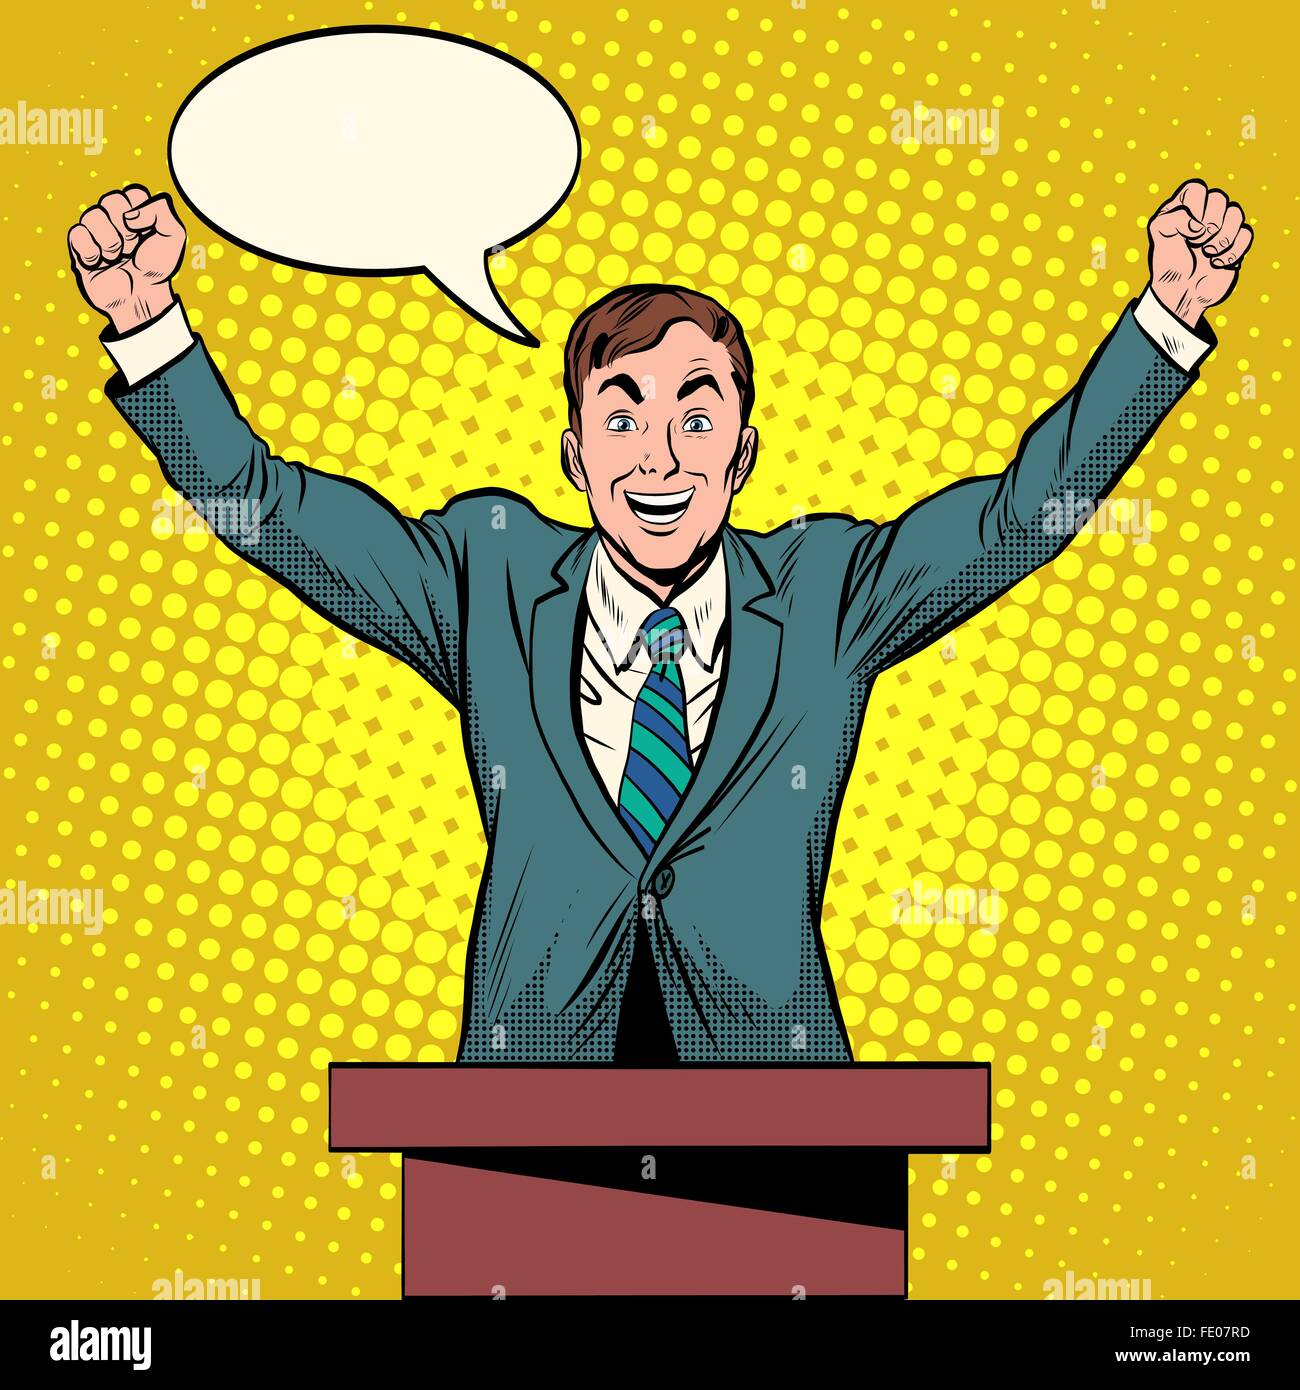 Speaker candidate speech at the podium - Stock Vector